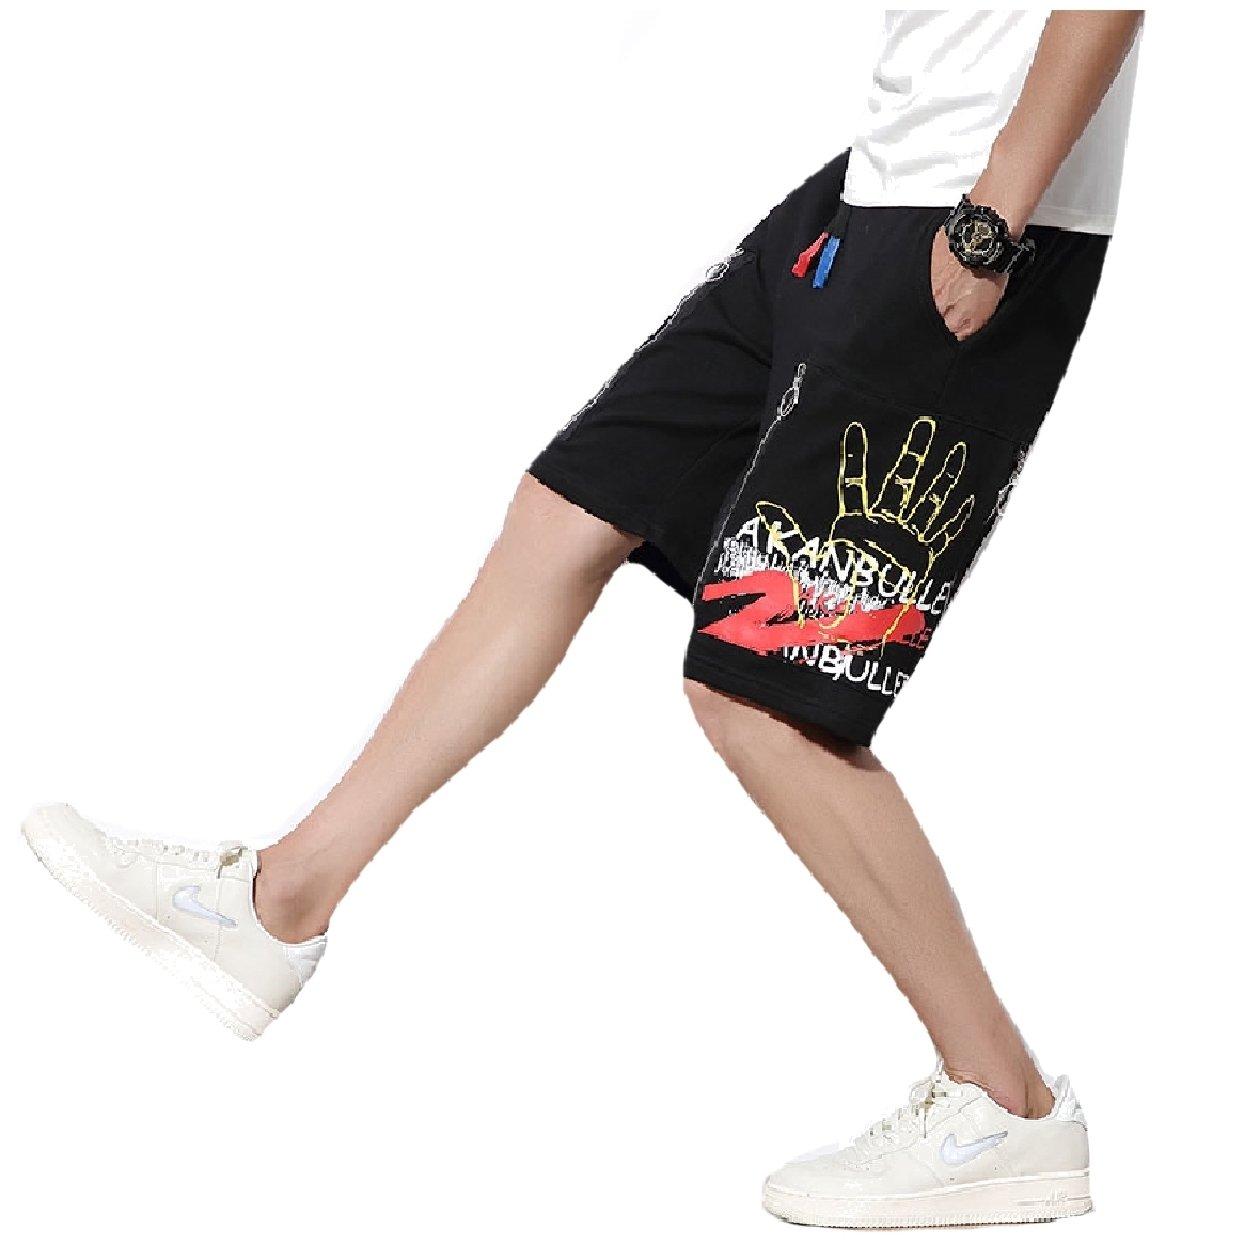 Zimaes-Men Zip Straight-Fit Fine Cotton Elastic Waist Midi Shorts Black XL by Zimaes-Men (Image #1)